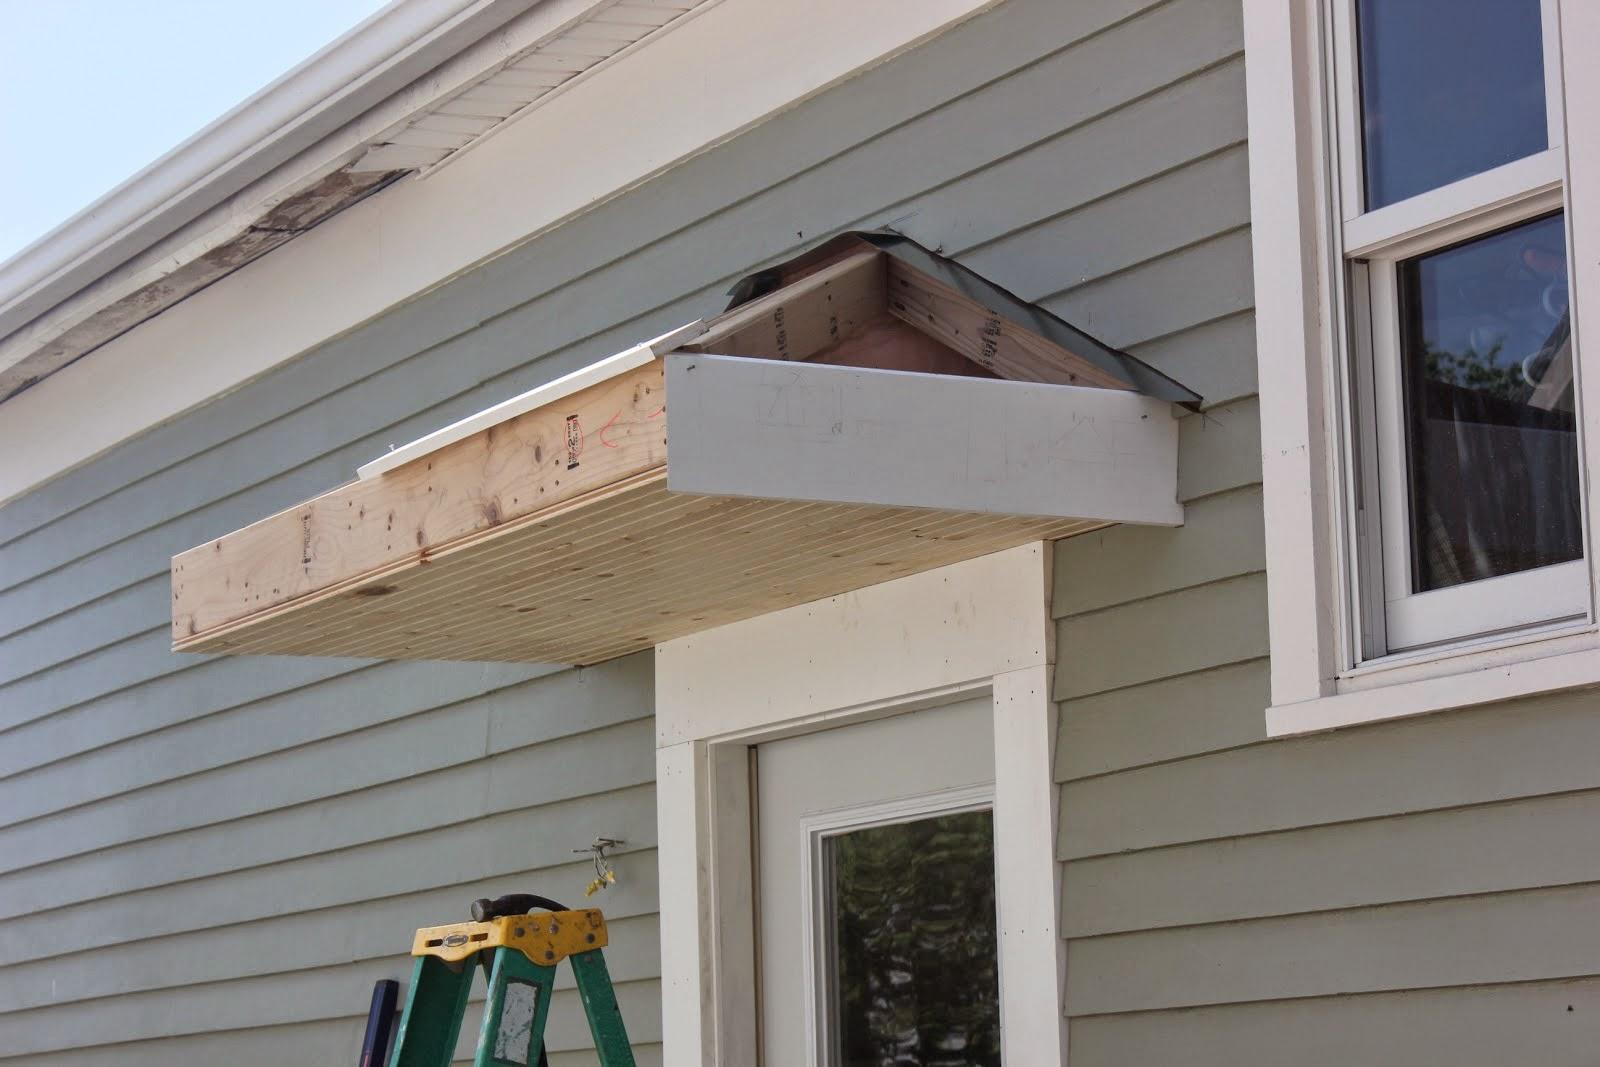 How To Build A Front Door Overhang Images